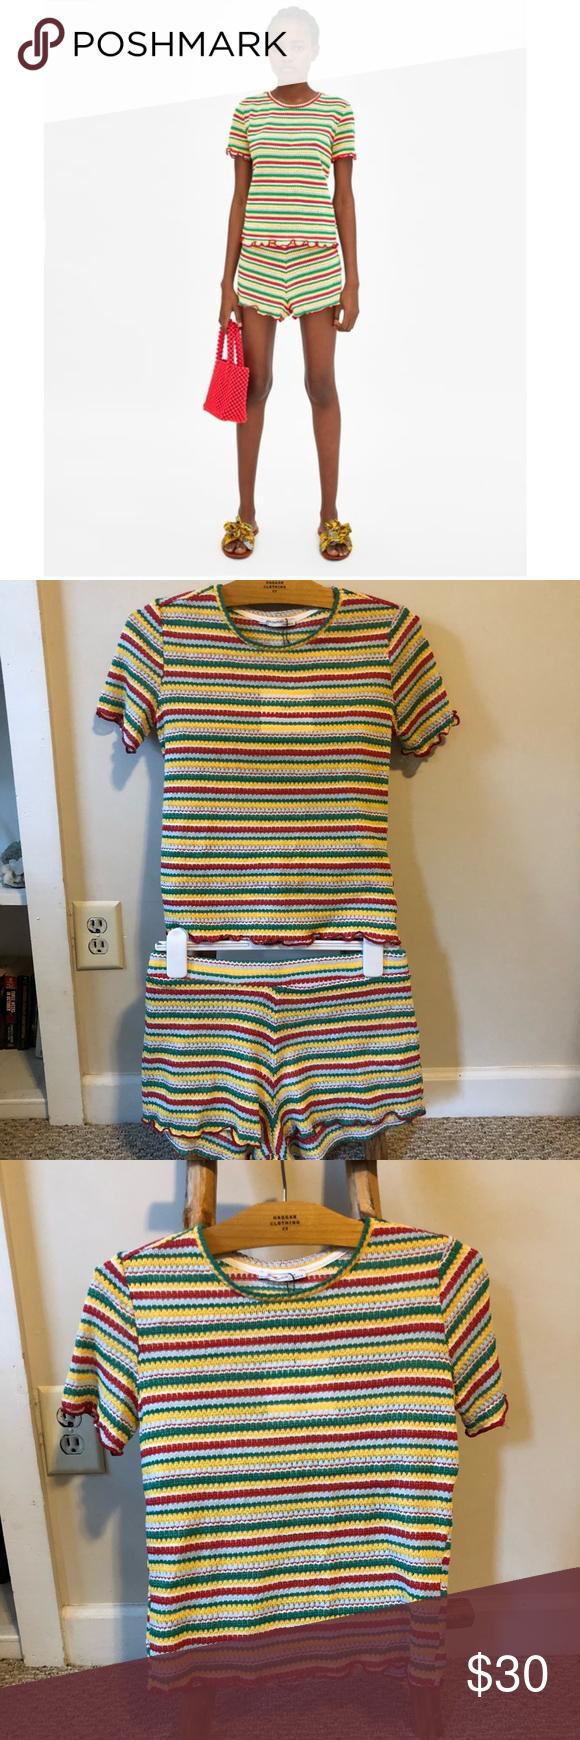 3fcba8a085 💥NEW Zara Striped Two Piece Set Brand new, never worn striped knit set from